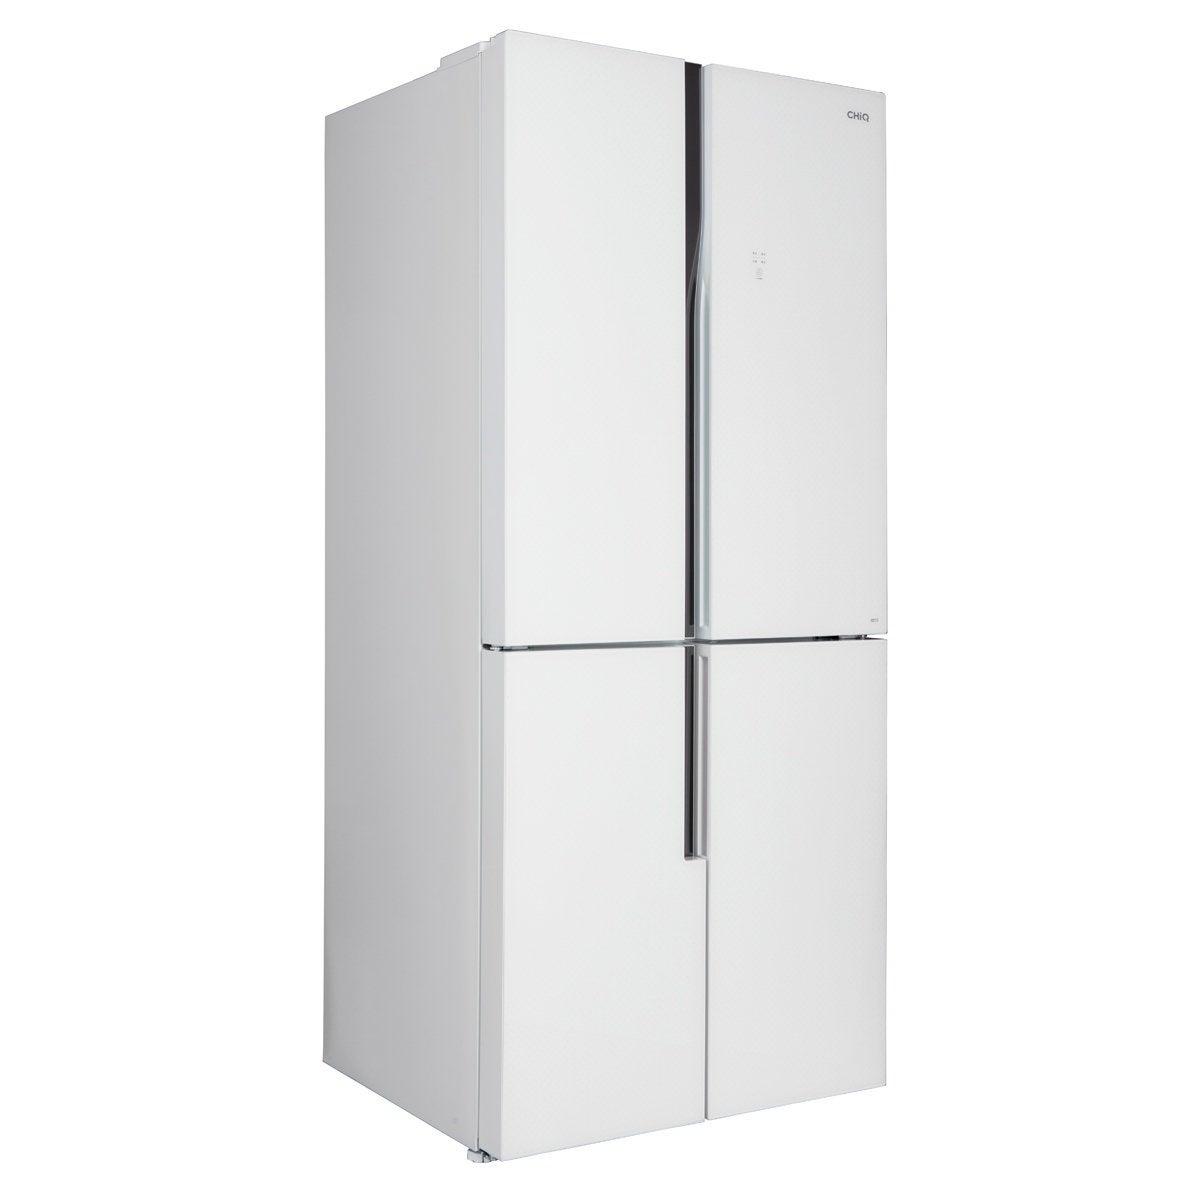 CHiQ CFD461GW Refrigerator